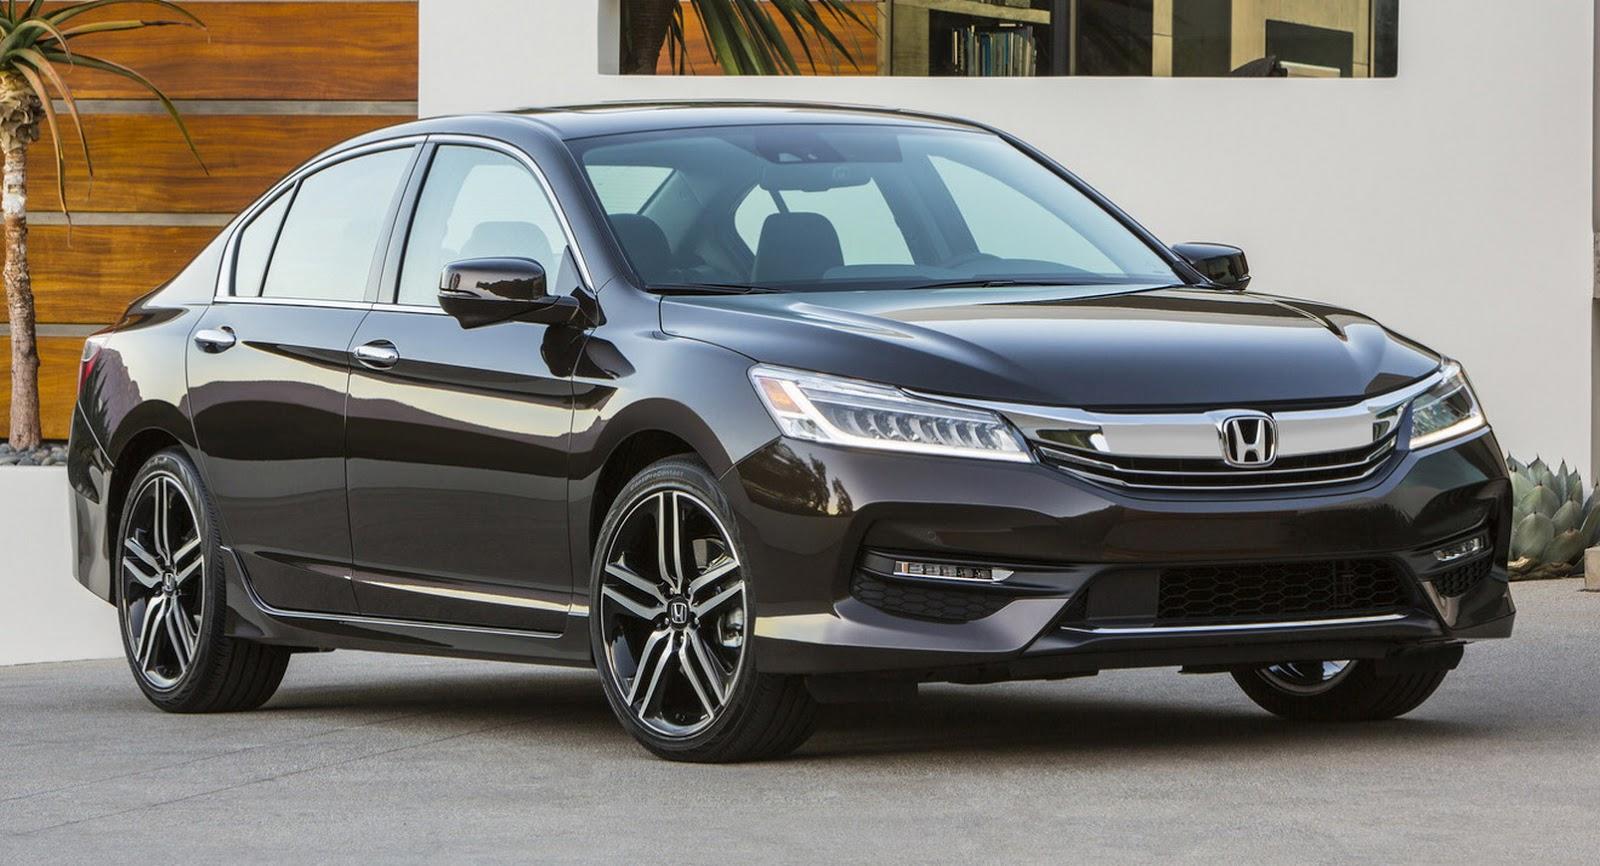 Хонда может восстановить поставки Accord вЕвропу